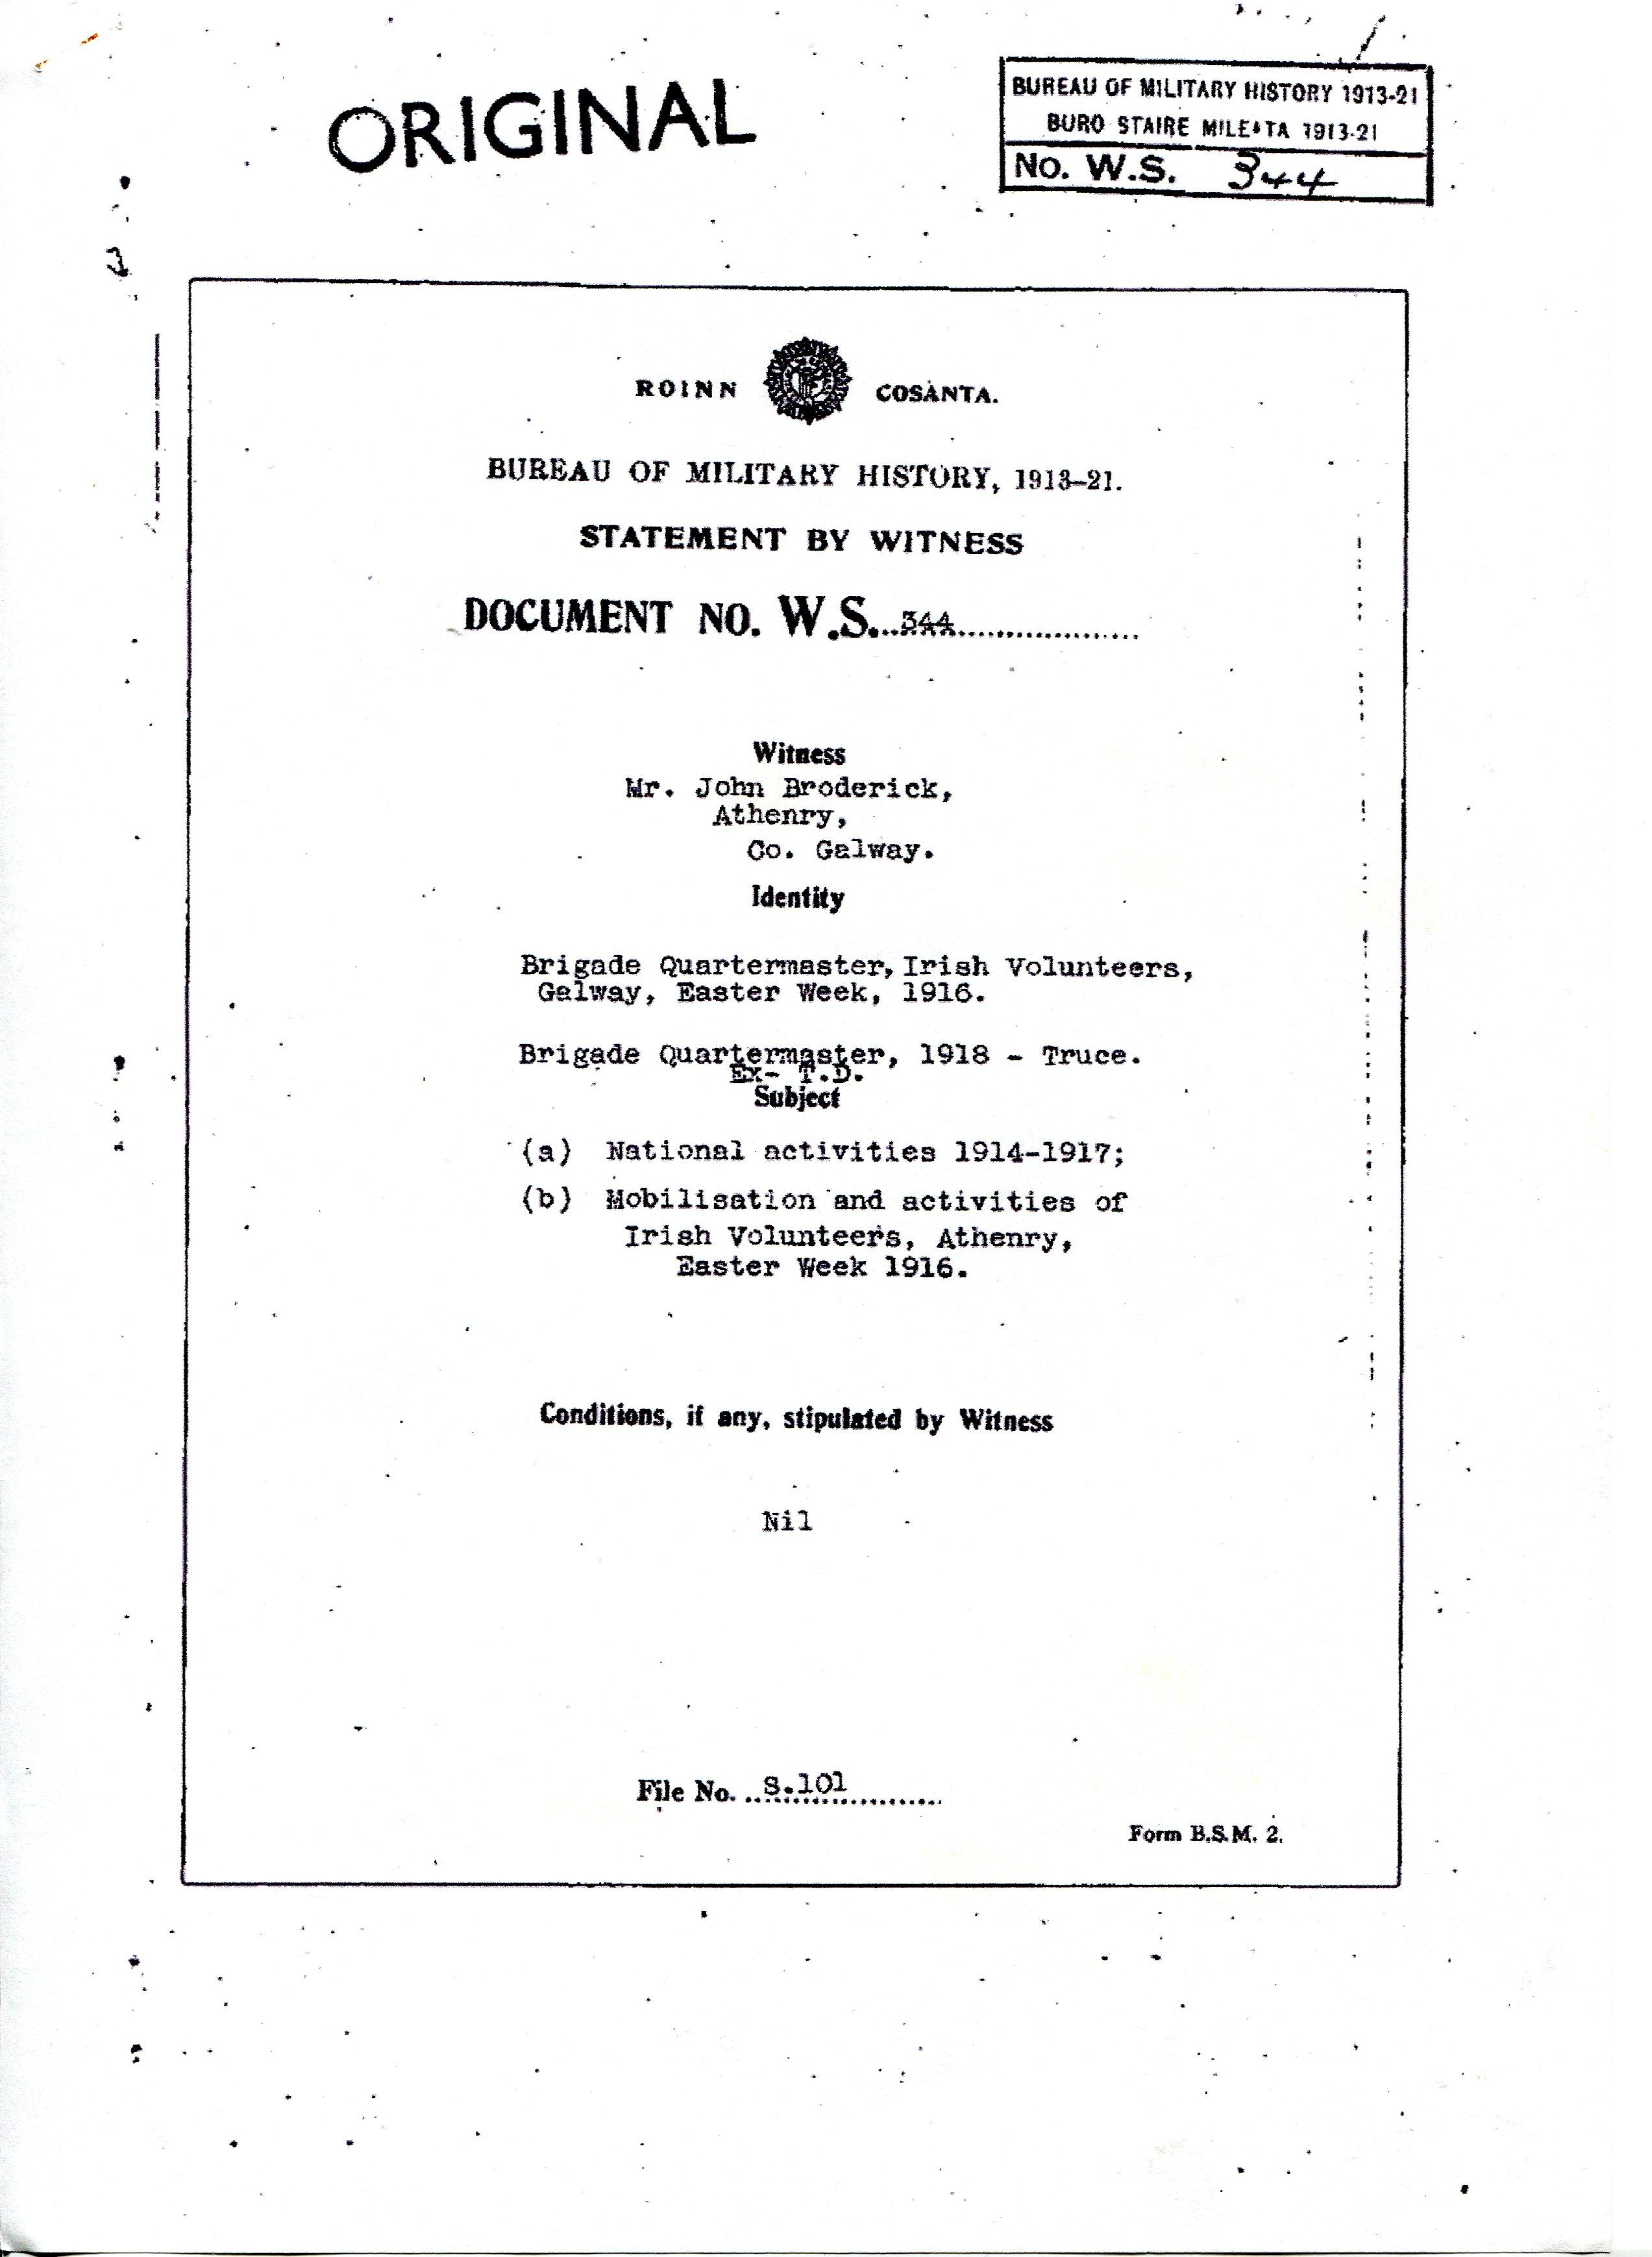 Bureau of Military History – John Broderick | Athenry Parish